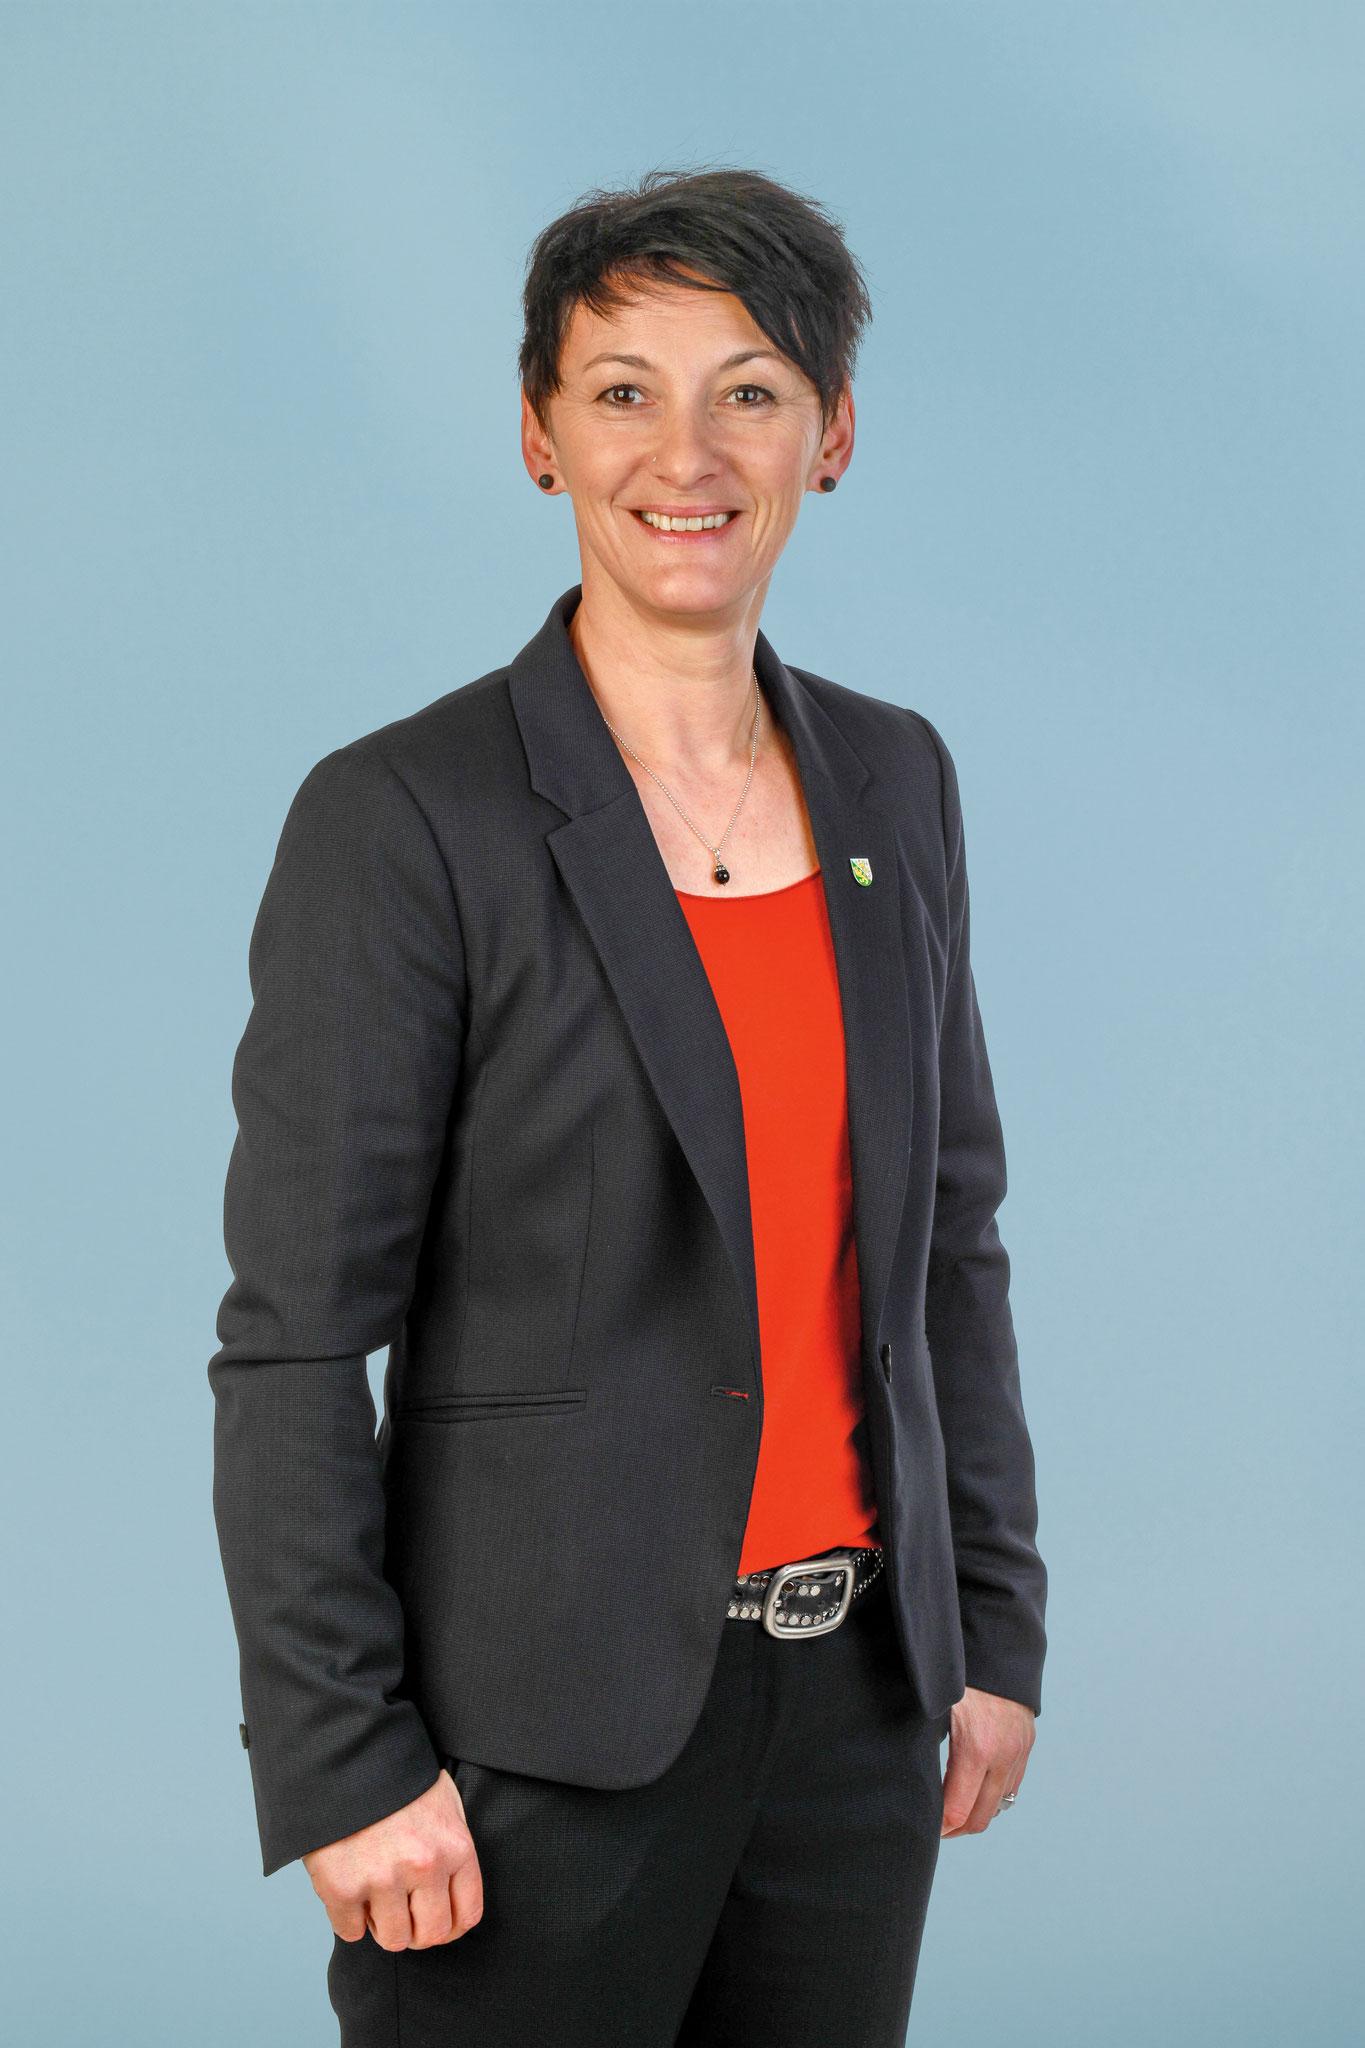 Kantonsratswahlen SP Liste 10 Thurgau Bezirk Arbon 15.03.2020 Portrait Kandidatin